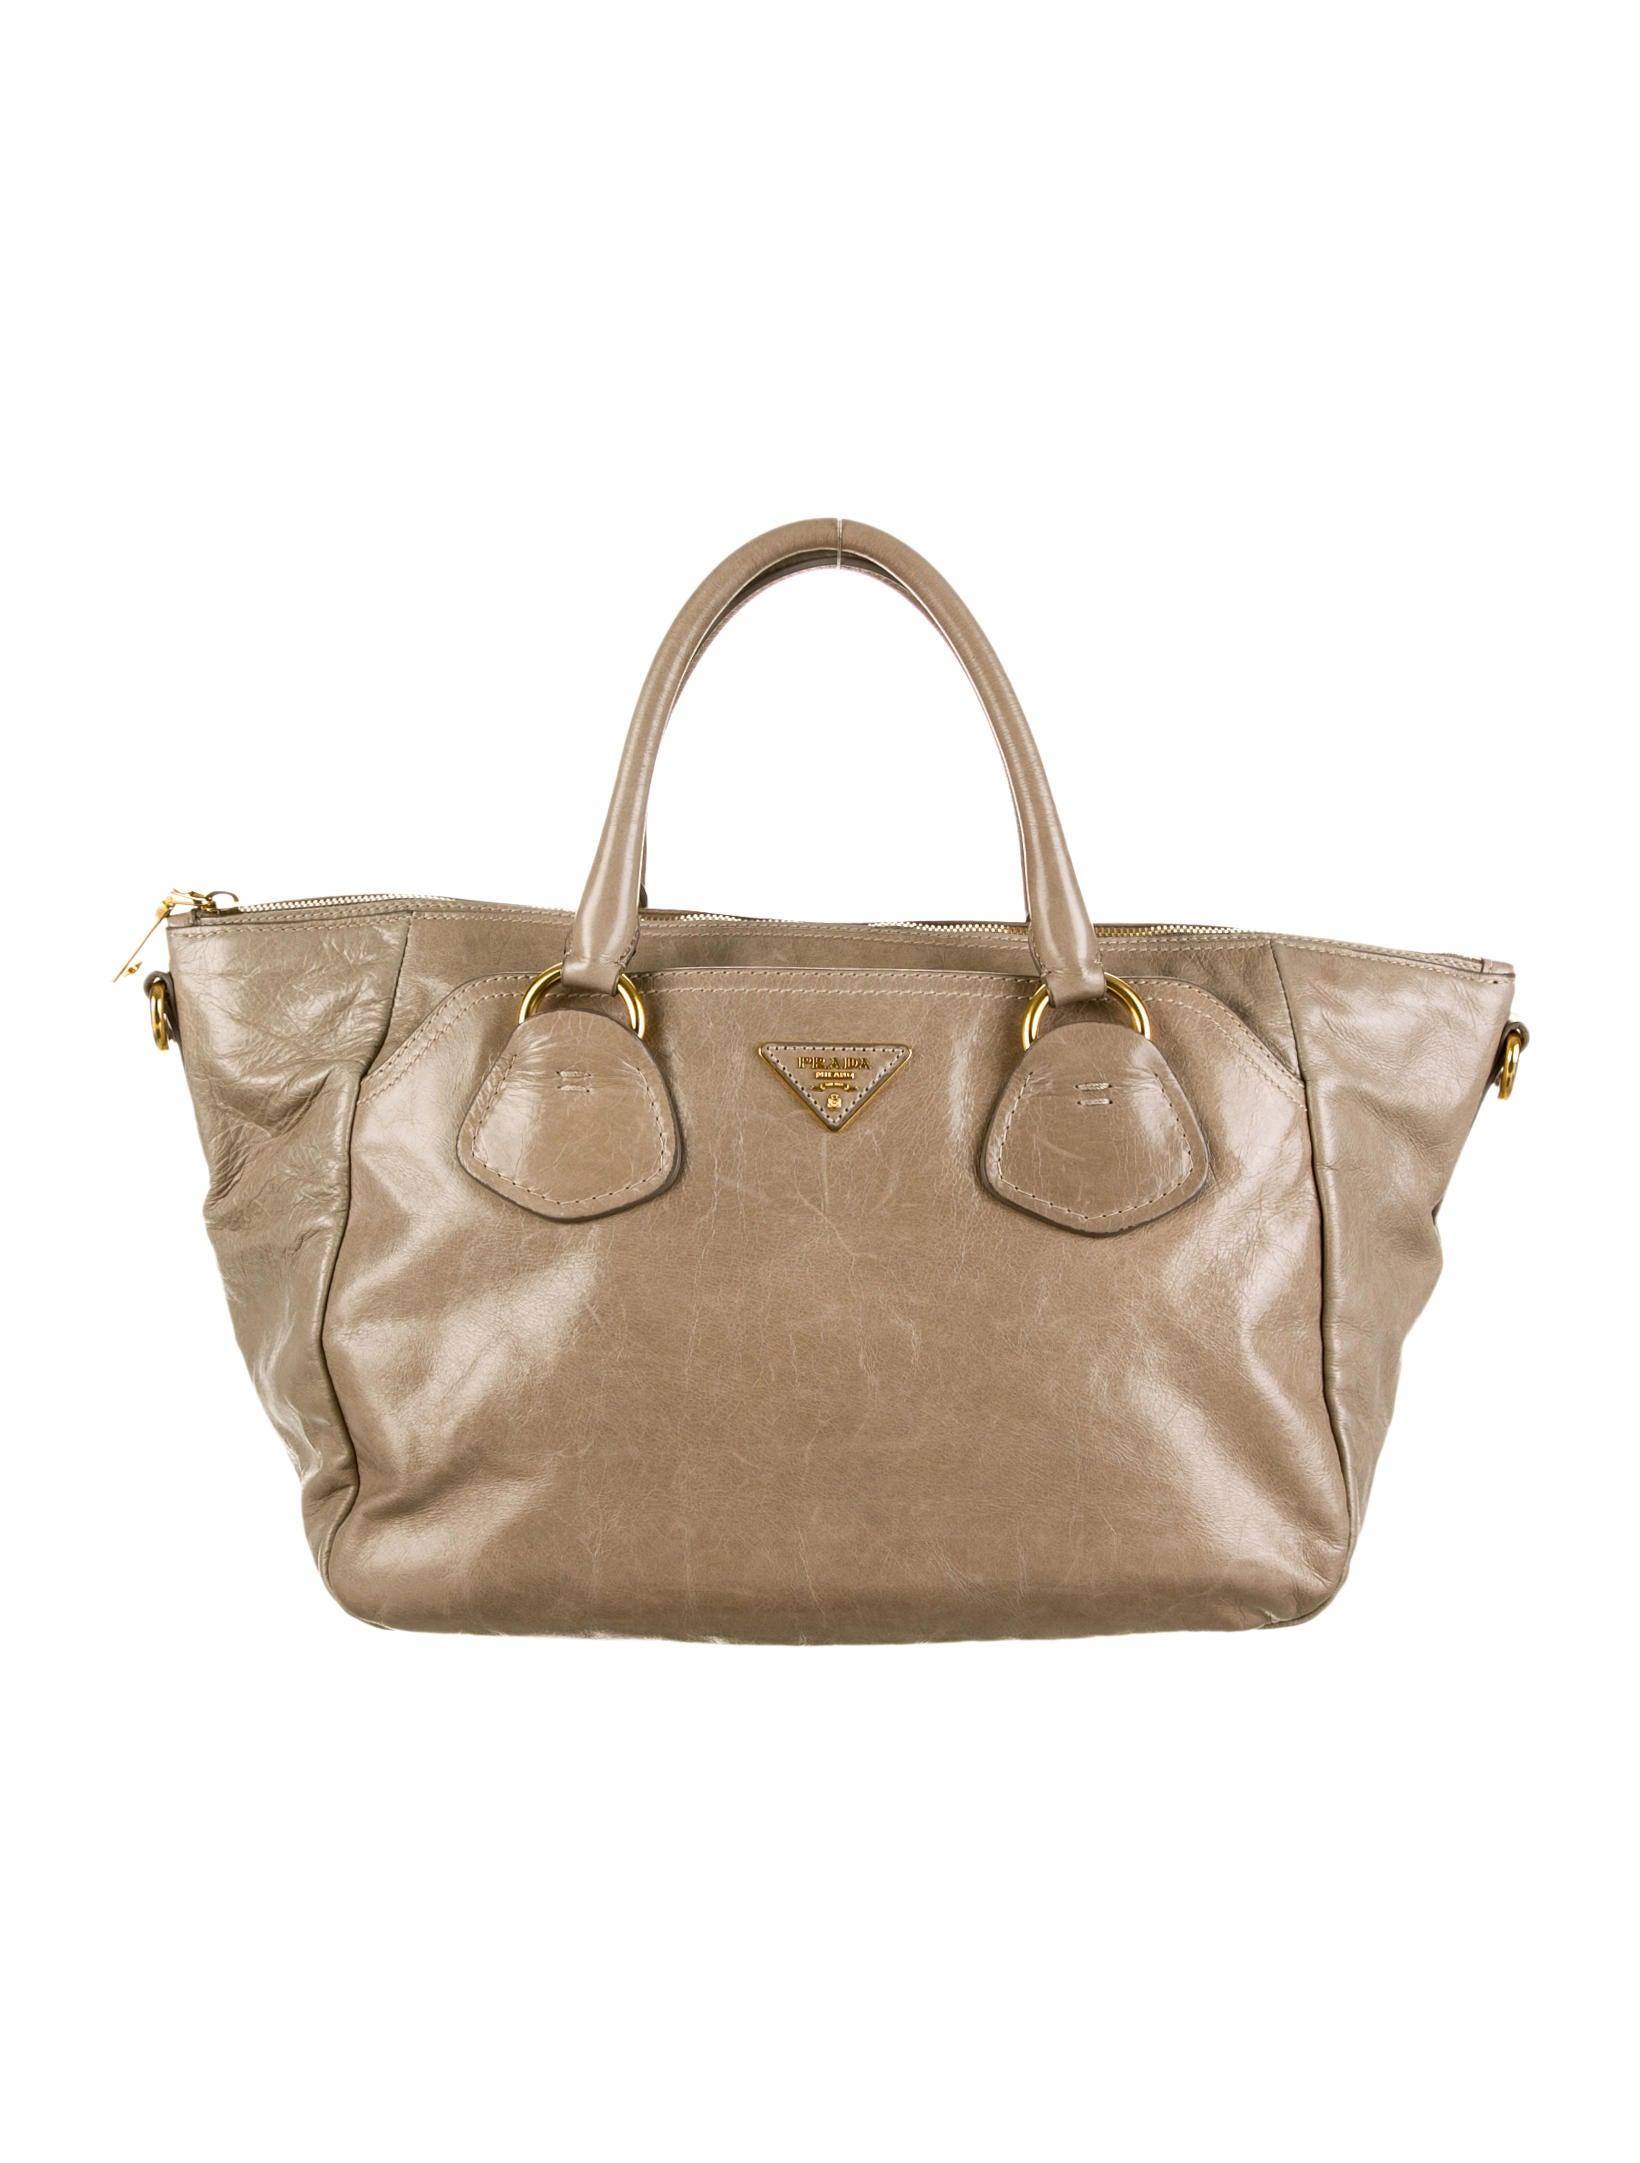 prices of prada purses - prada vitello shine satchel, prada men's wallets